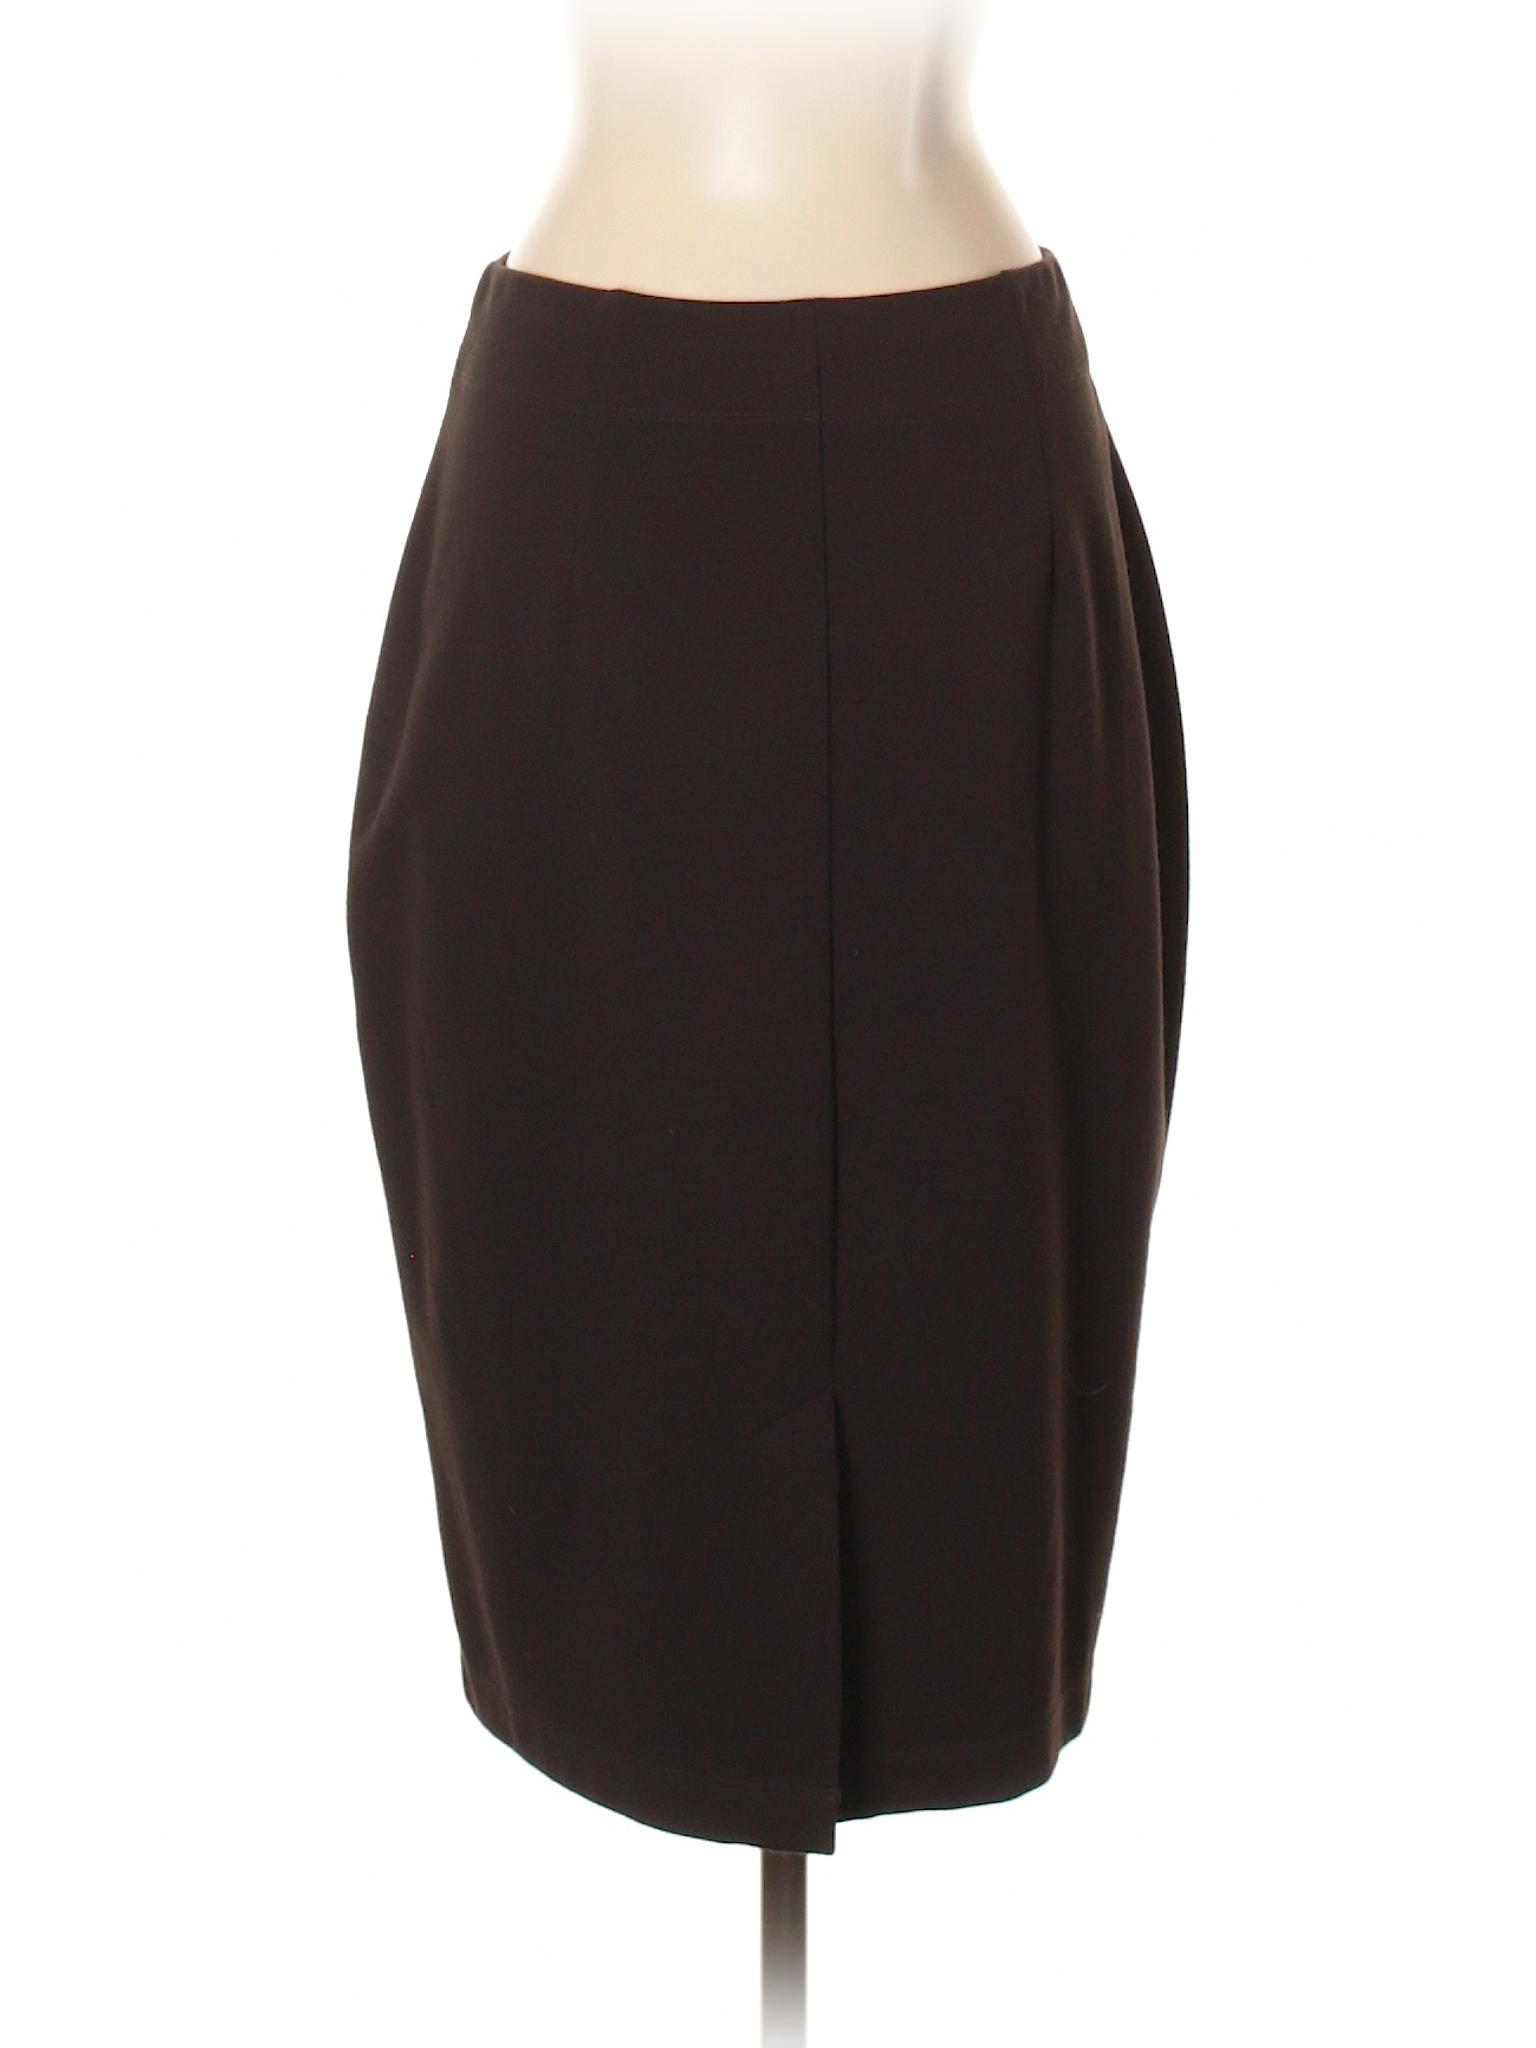 winter Skirt Leisure Casual Eileen Fisher WUxqPwxg1O